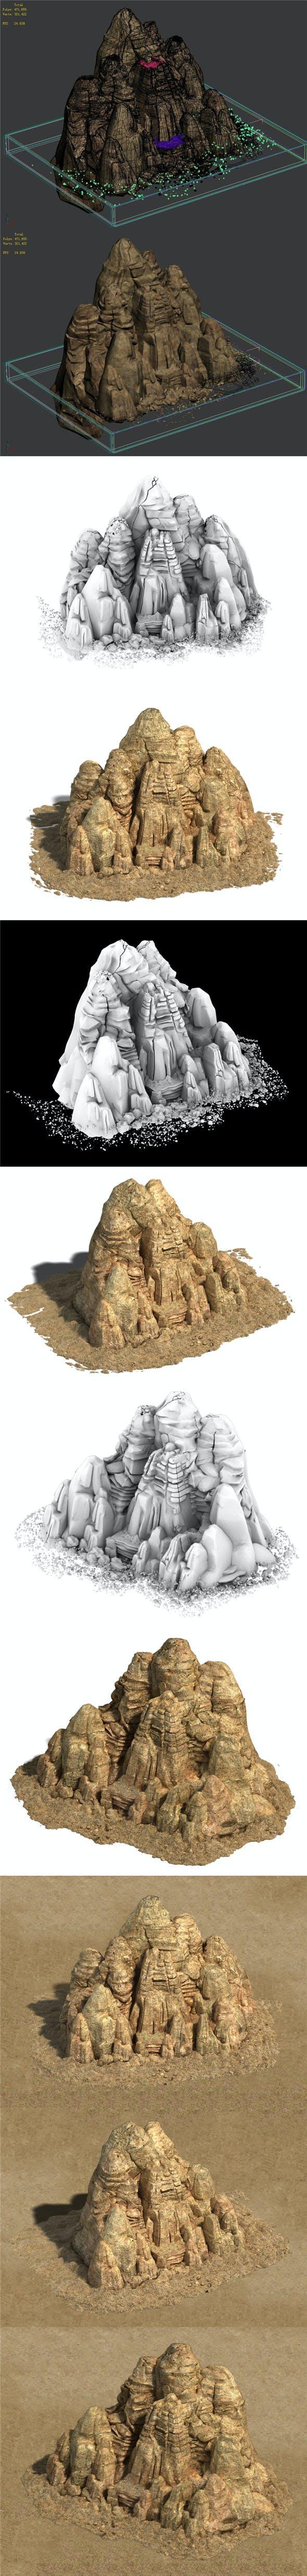 Desert - Yamagata 01 - 3DOcean Item for Sale